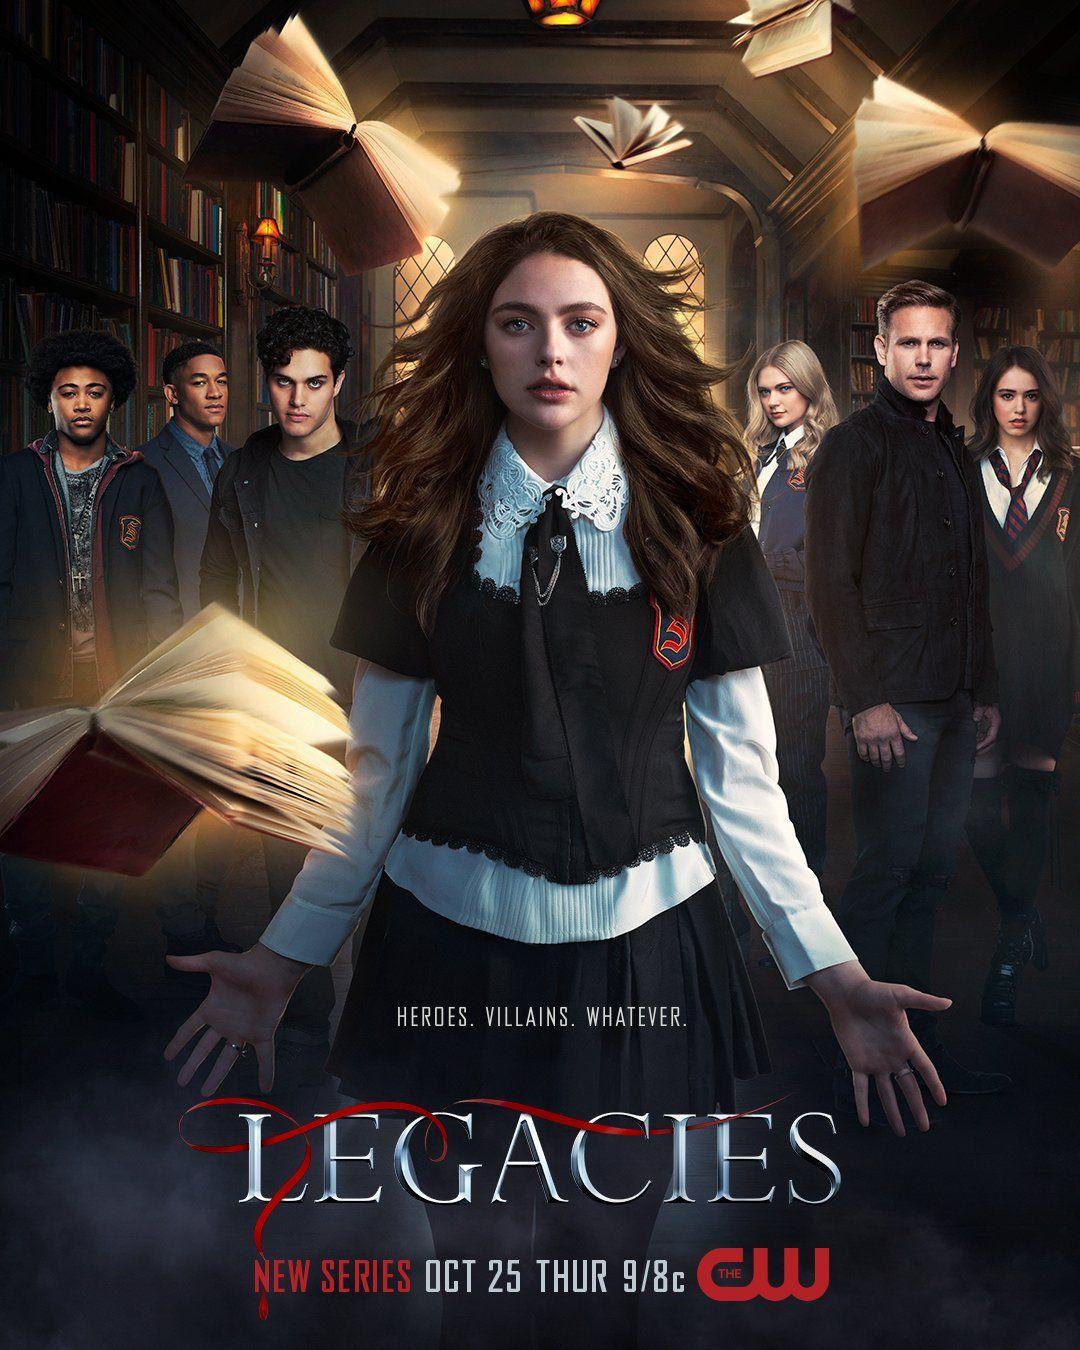 Legacies Season 1